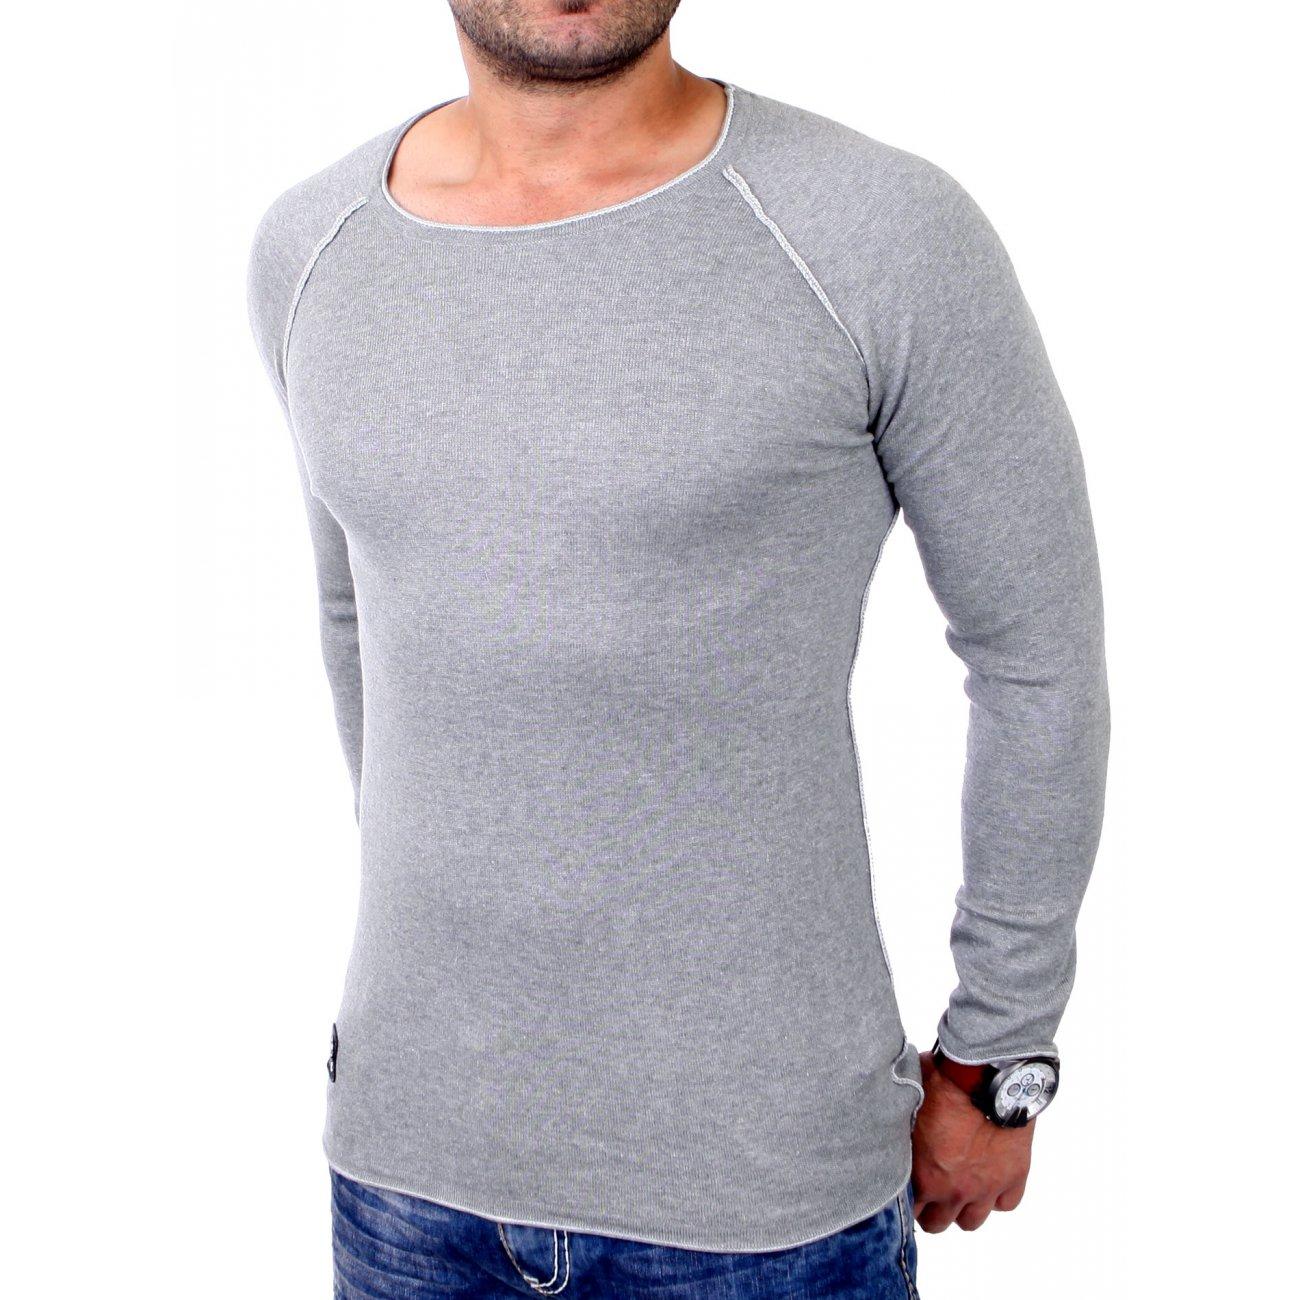 redbridge sweatshirt herren rundhals slim fit pullover. Black Bedroom Furniture Sets. Home Design Ideas